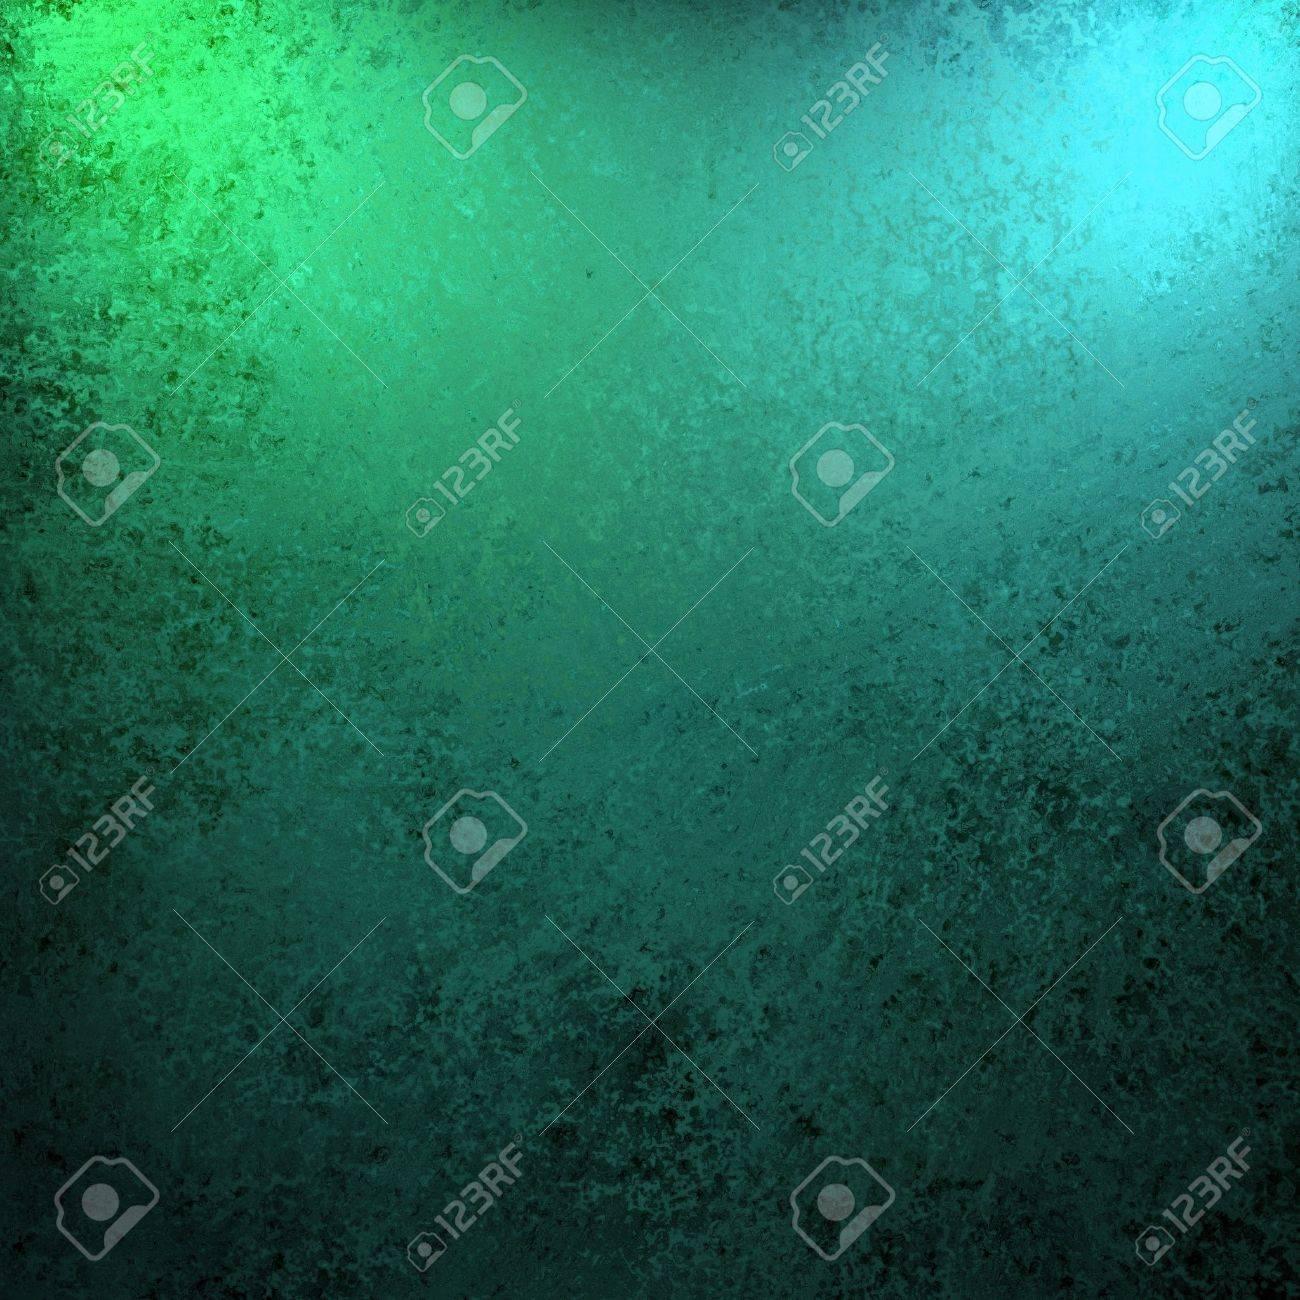 Teal Grunge Texture